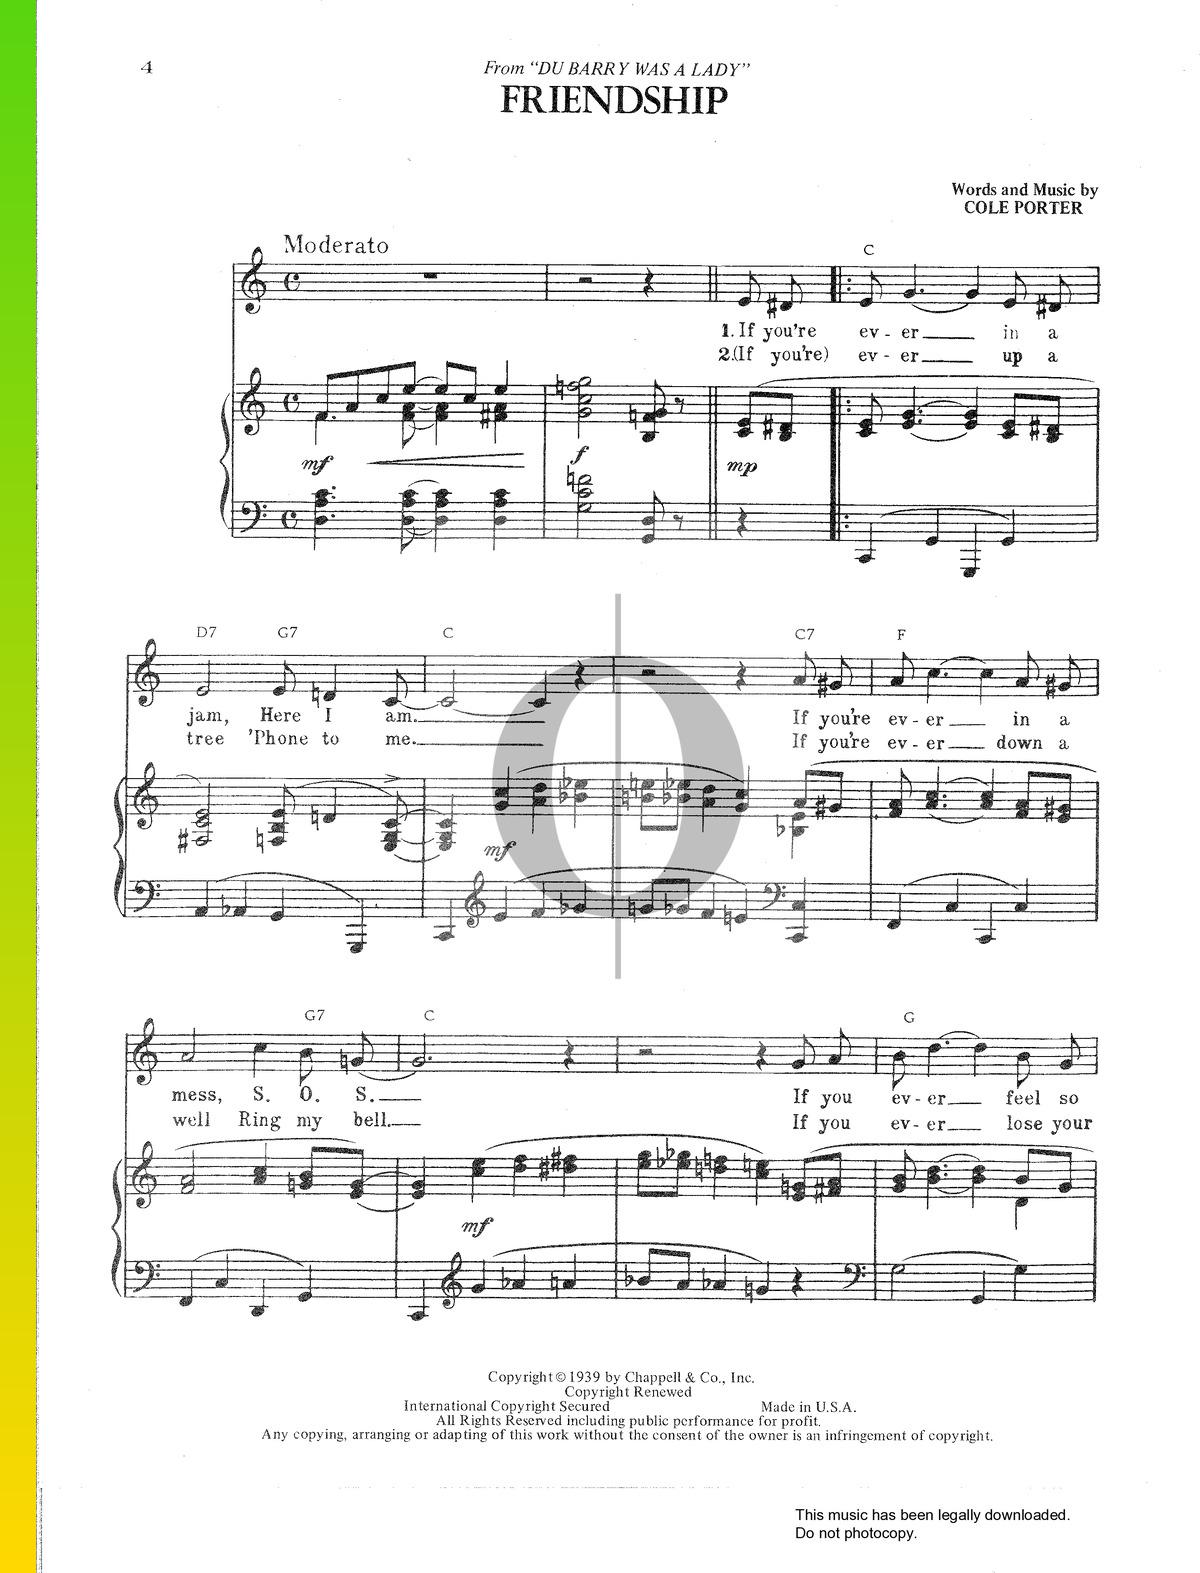 about friendship mp3 music sheet   print and play sheet music  think.scmc.it